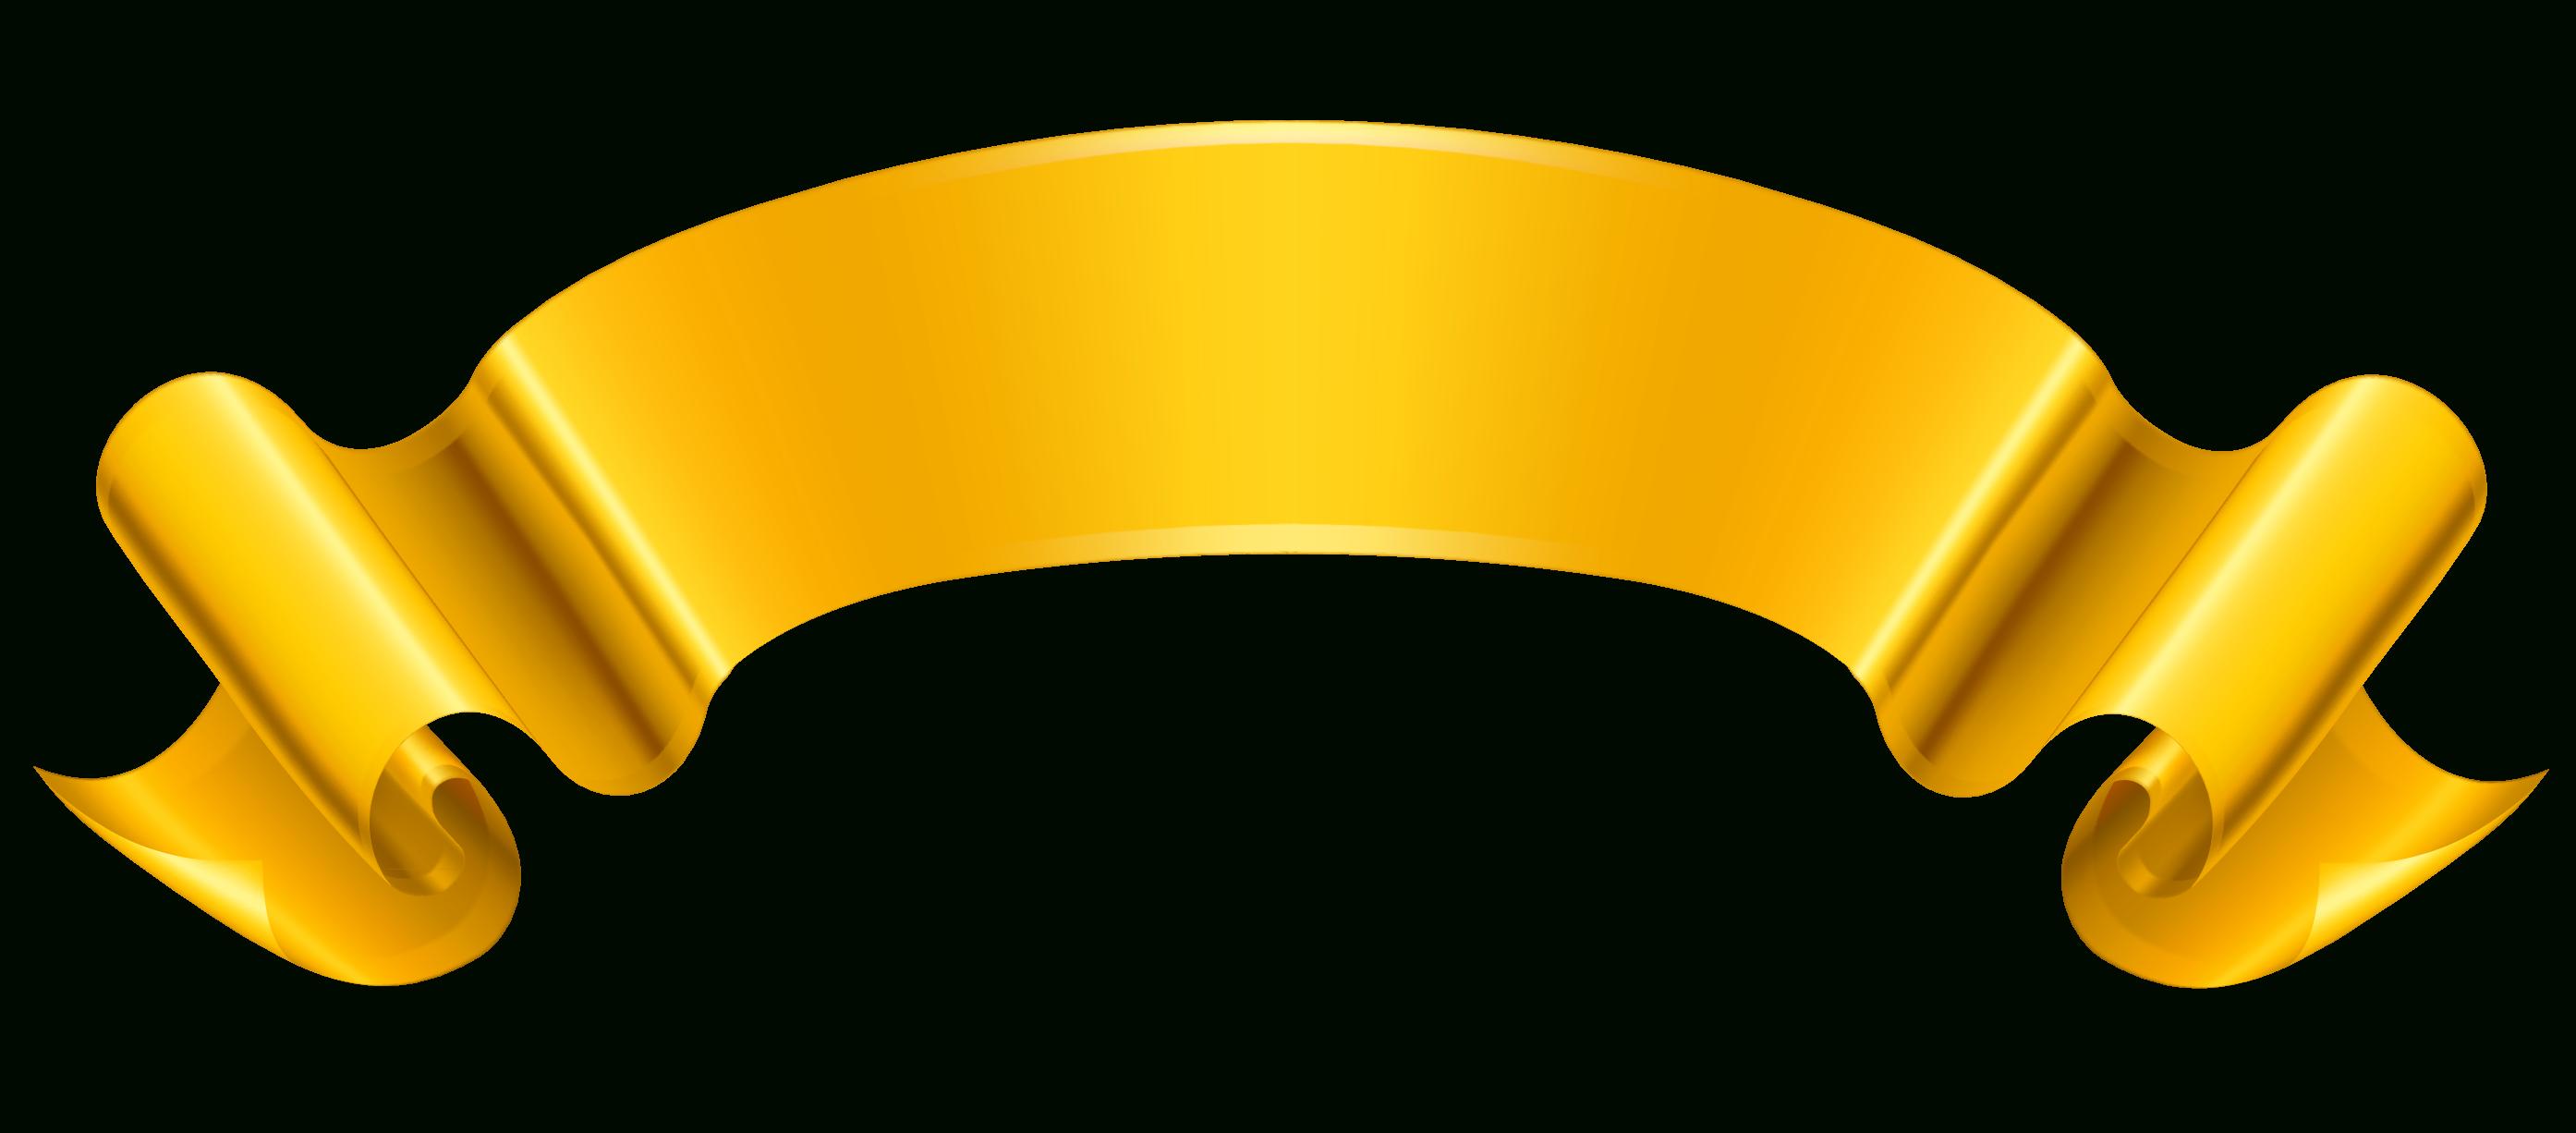 Clipart banner yellow ribbon. Gold clip art cyberuse